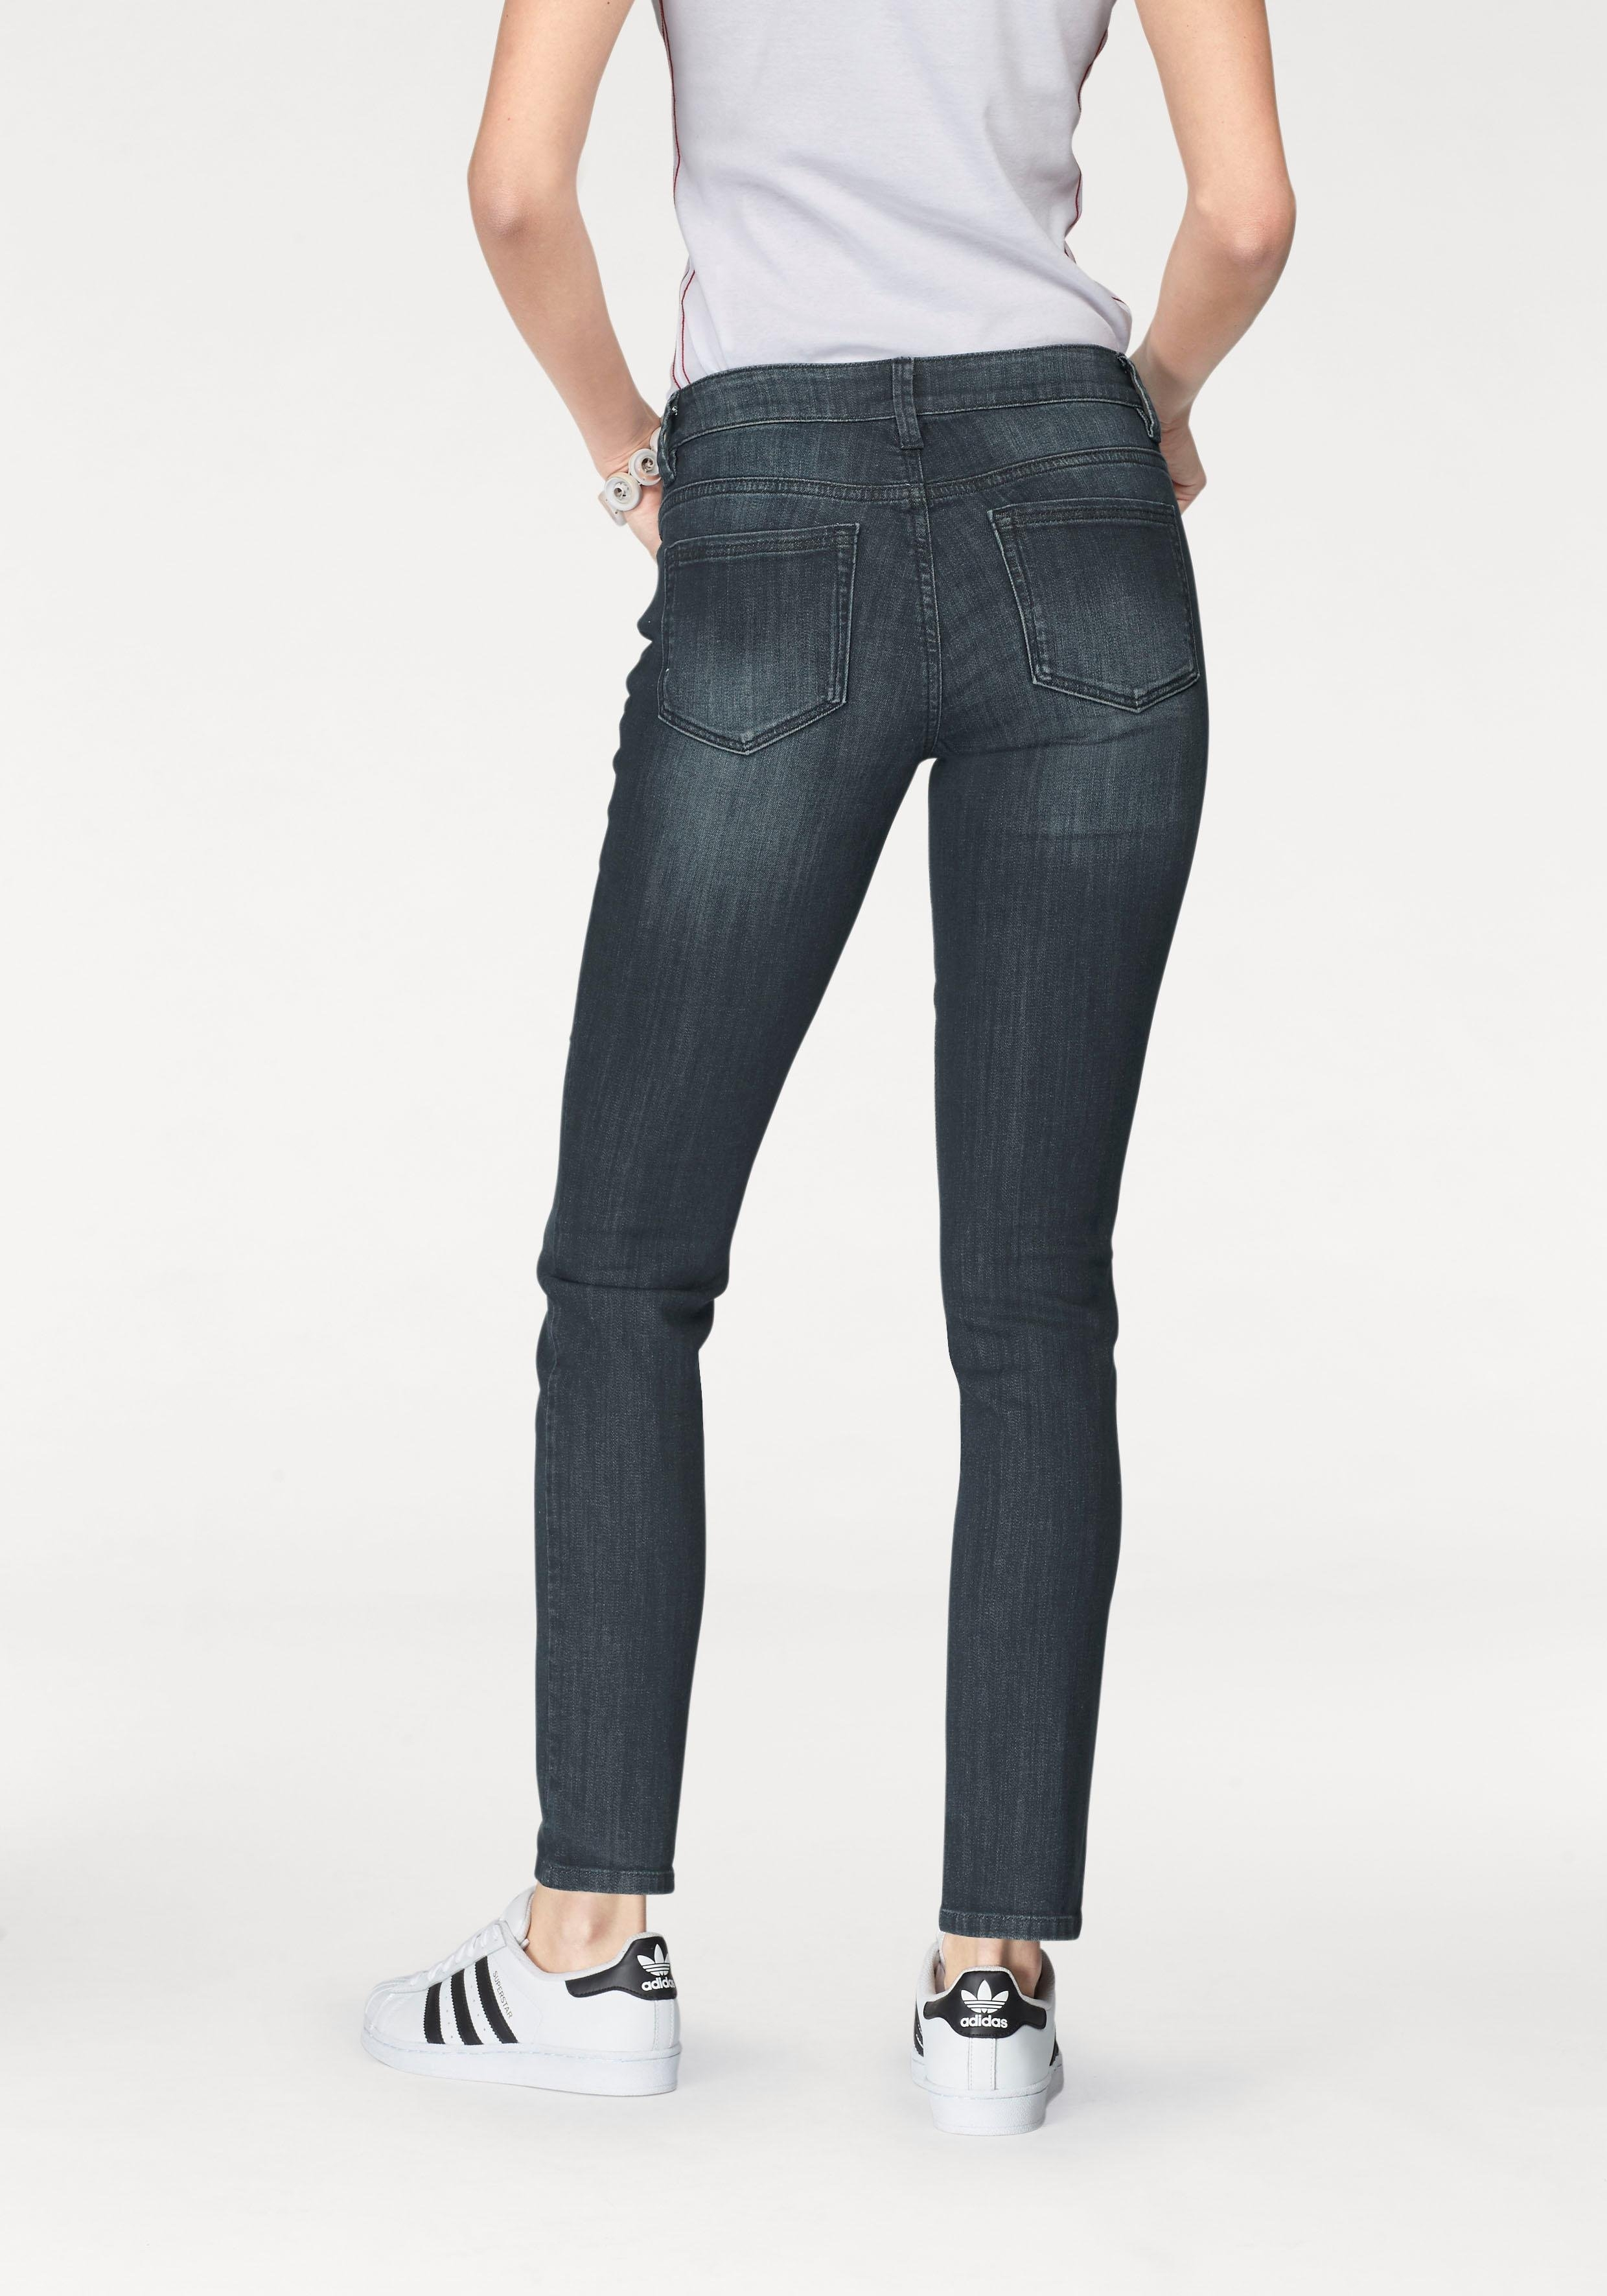 d0450b1ffc9ec8 Afbeeldingsbron  Tom Tailor slim fit jeans »Alexa«